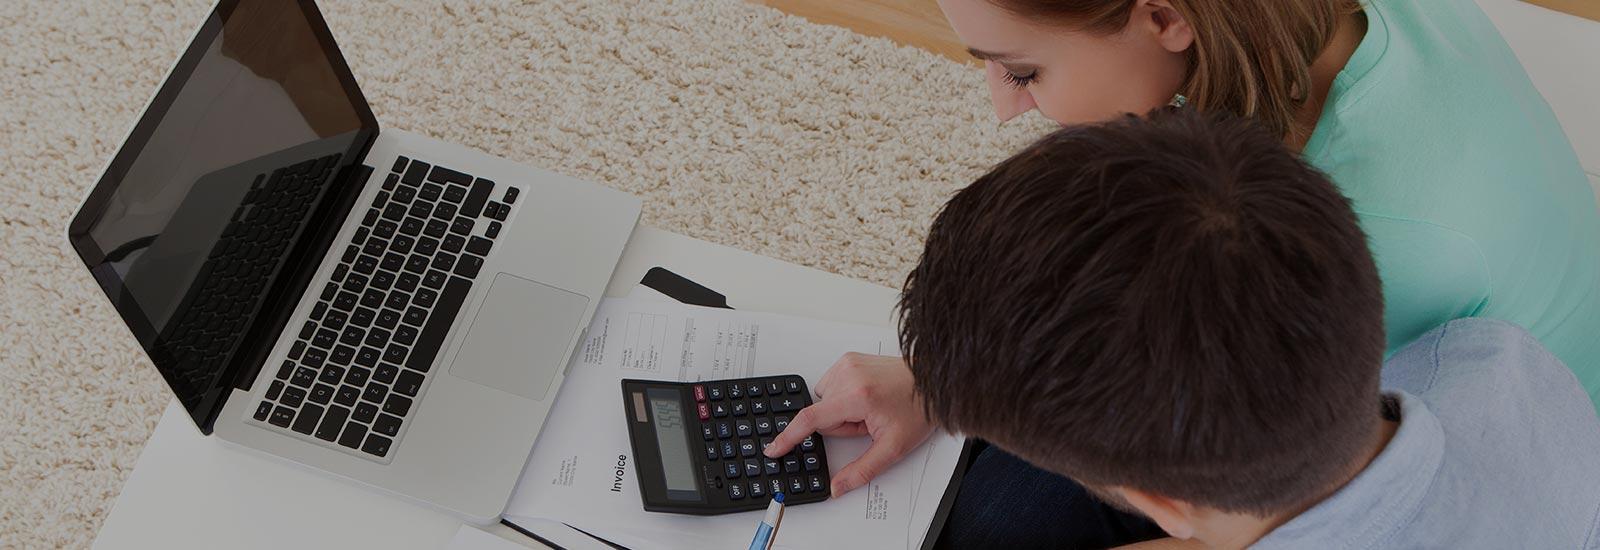 NSLU-article-title-bg-proven-strategy-reduce-debt